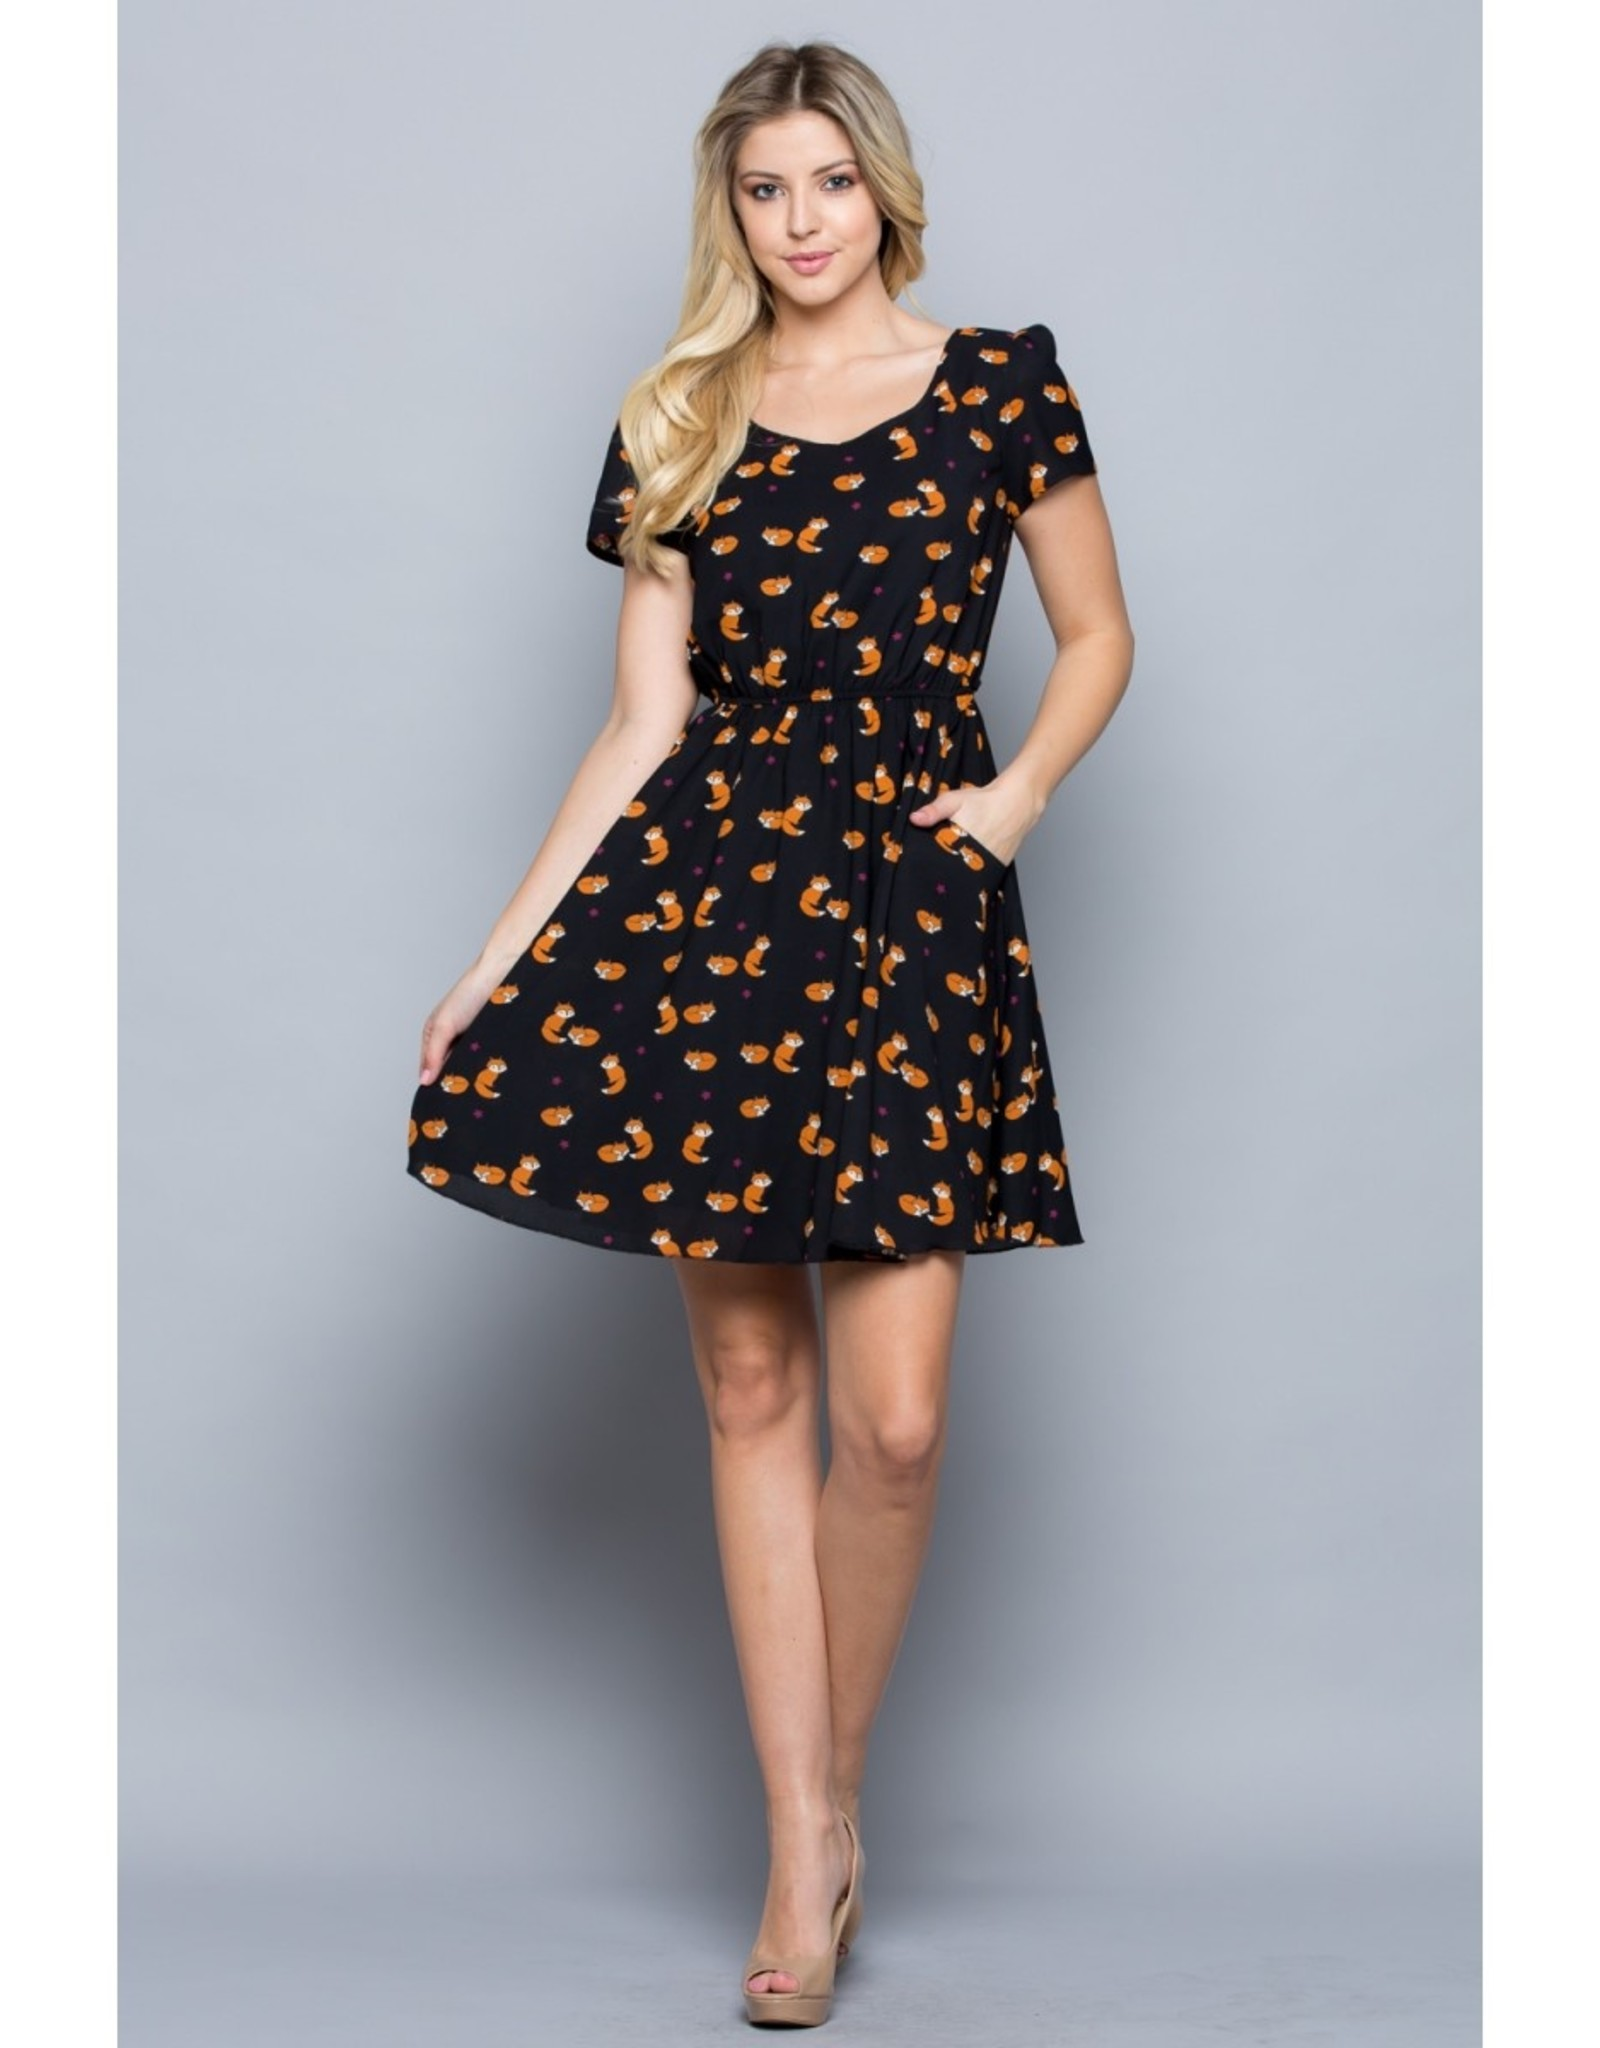 Fox Print Dress with Elastic Waist